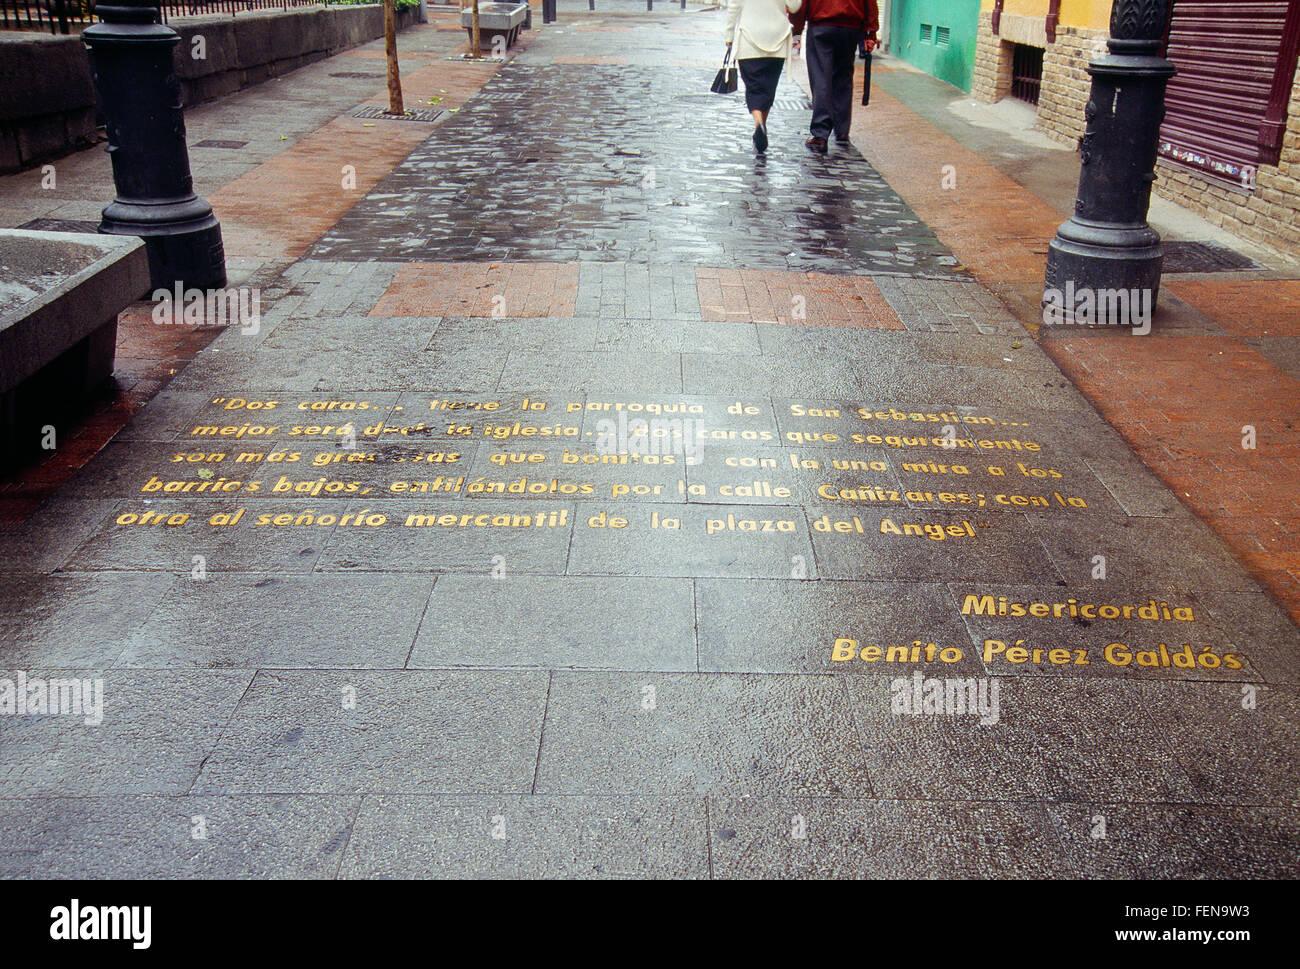 Texto literario en el pavimento. La calle Huertas, Madrid, España. Imagen De Stock